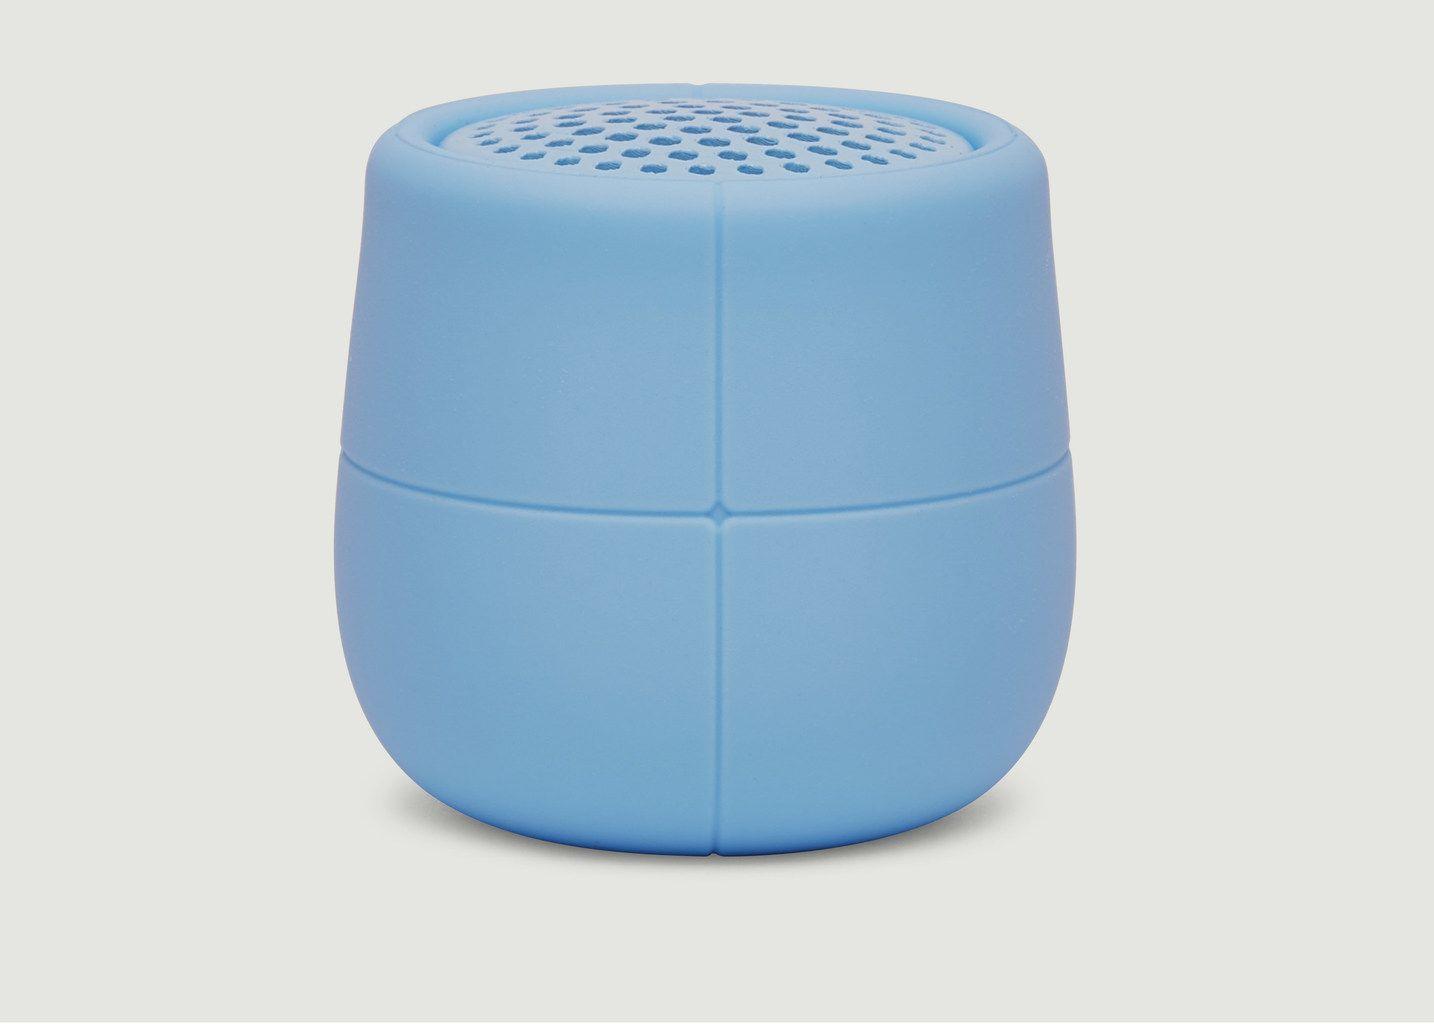 Lexon - Mino X Water Resistant Bluetooth Speaker - Light Blue